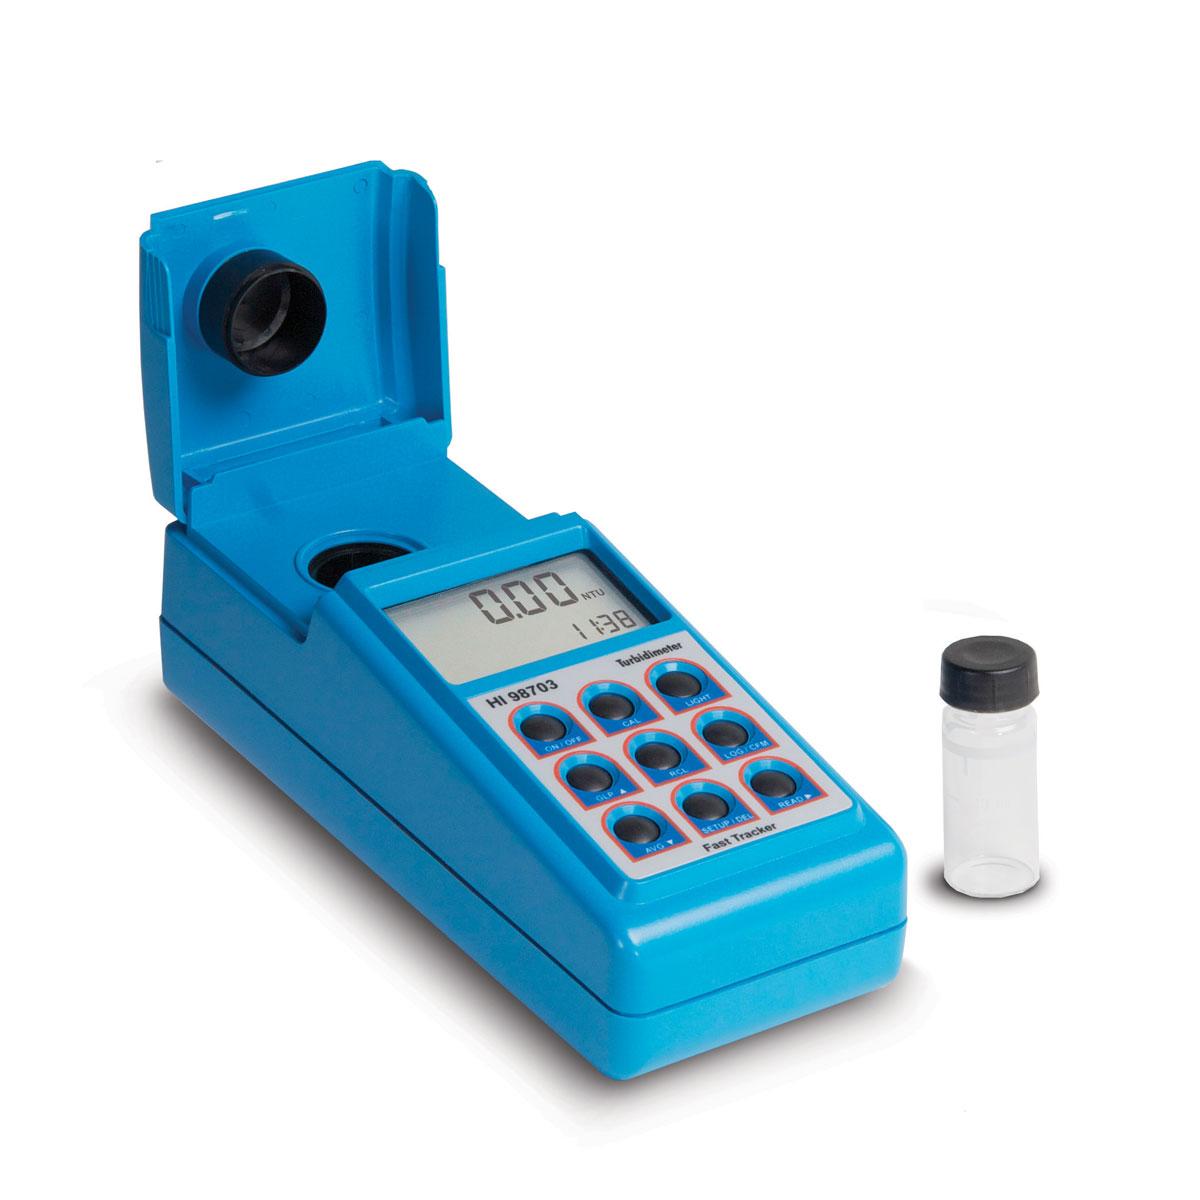 Medidor Portátil de Turbidez (EPA) - HI98703-02